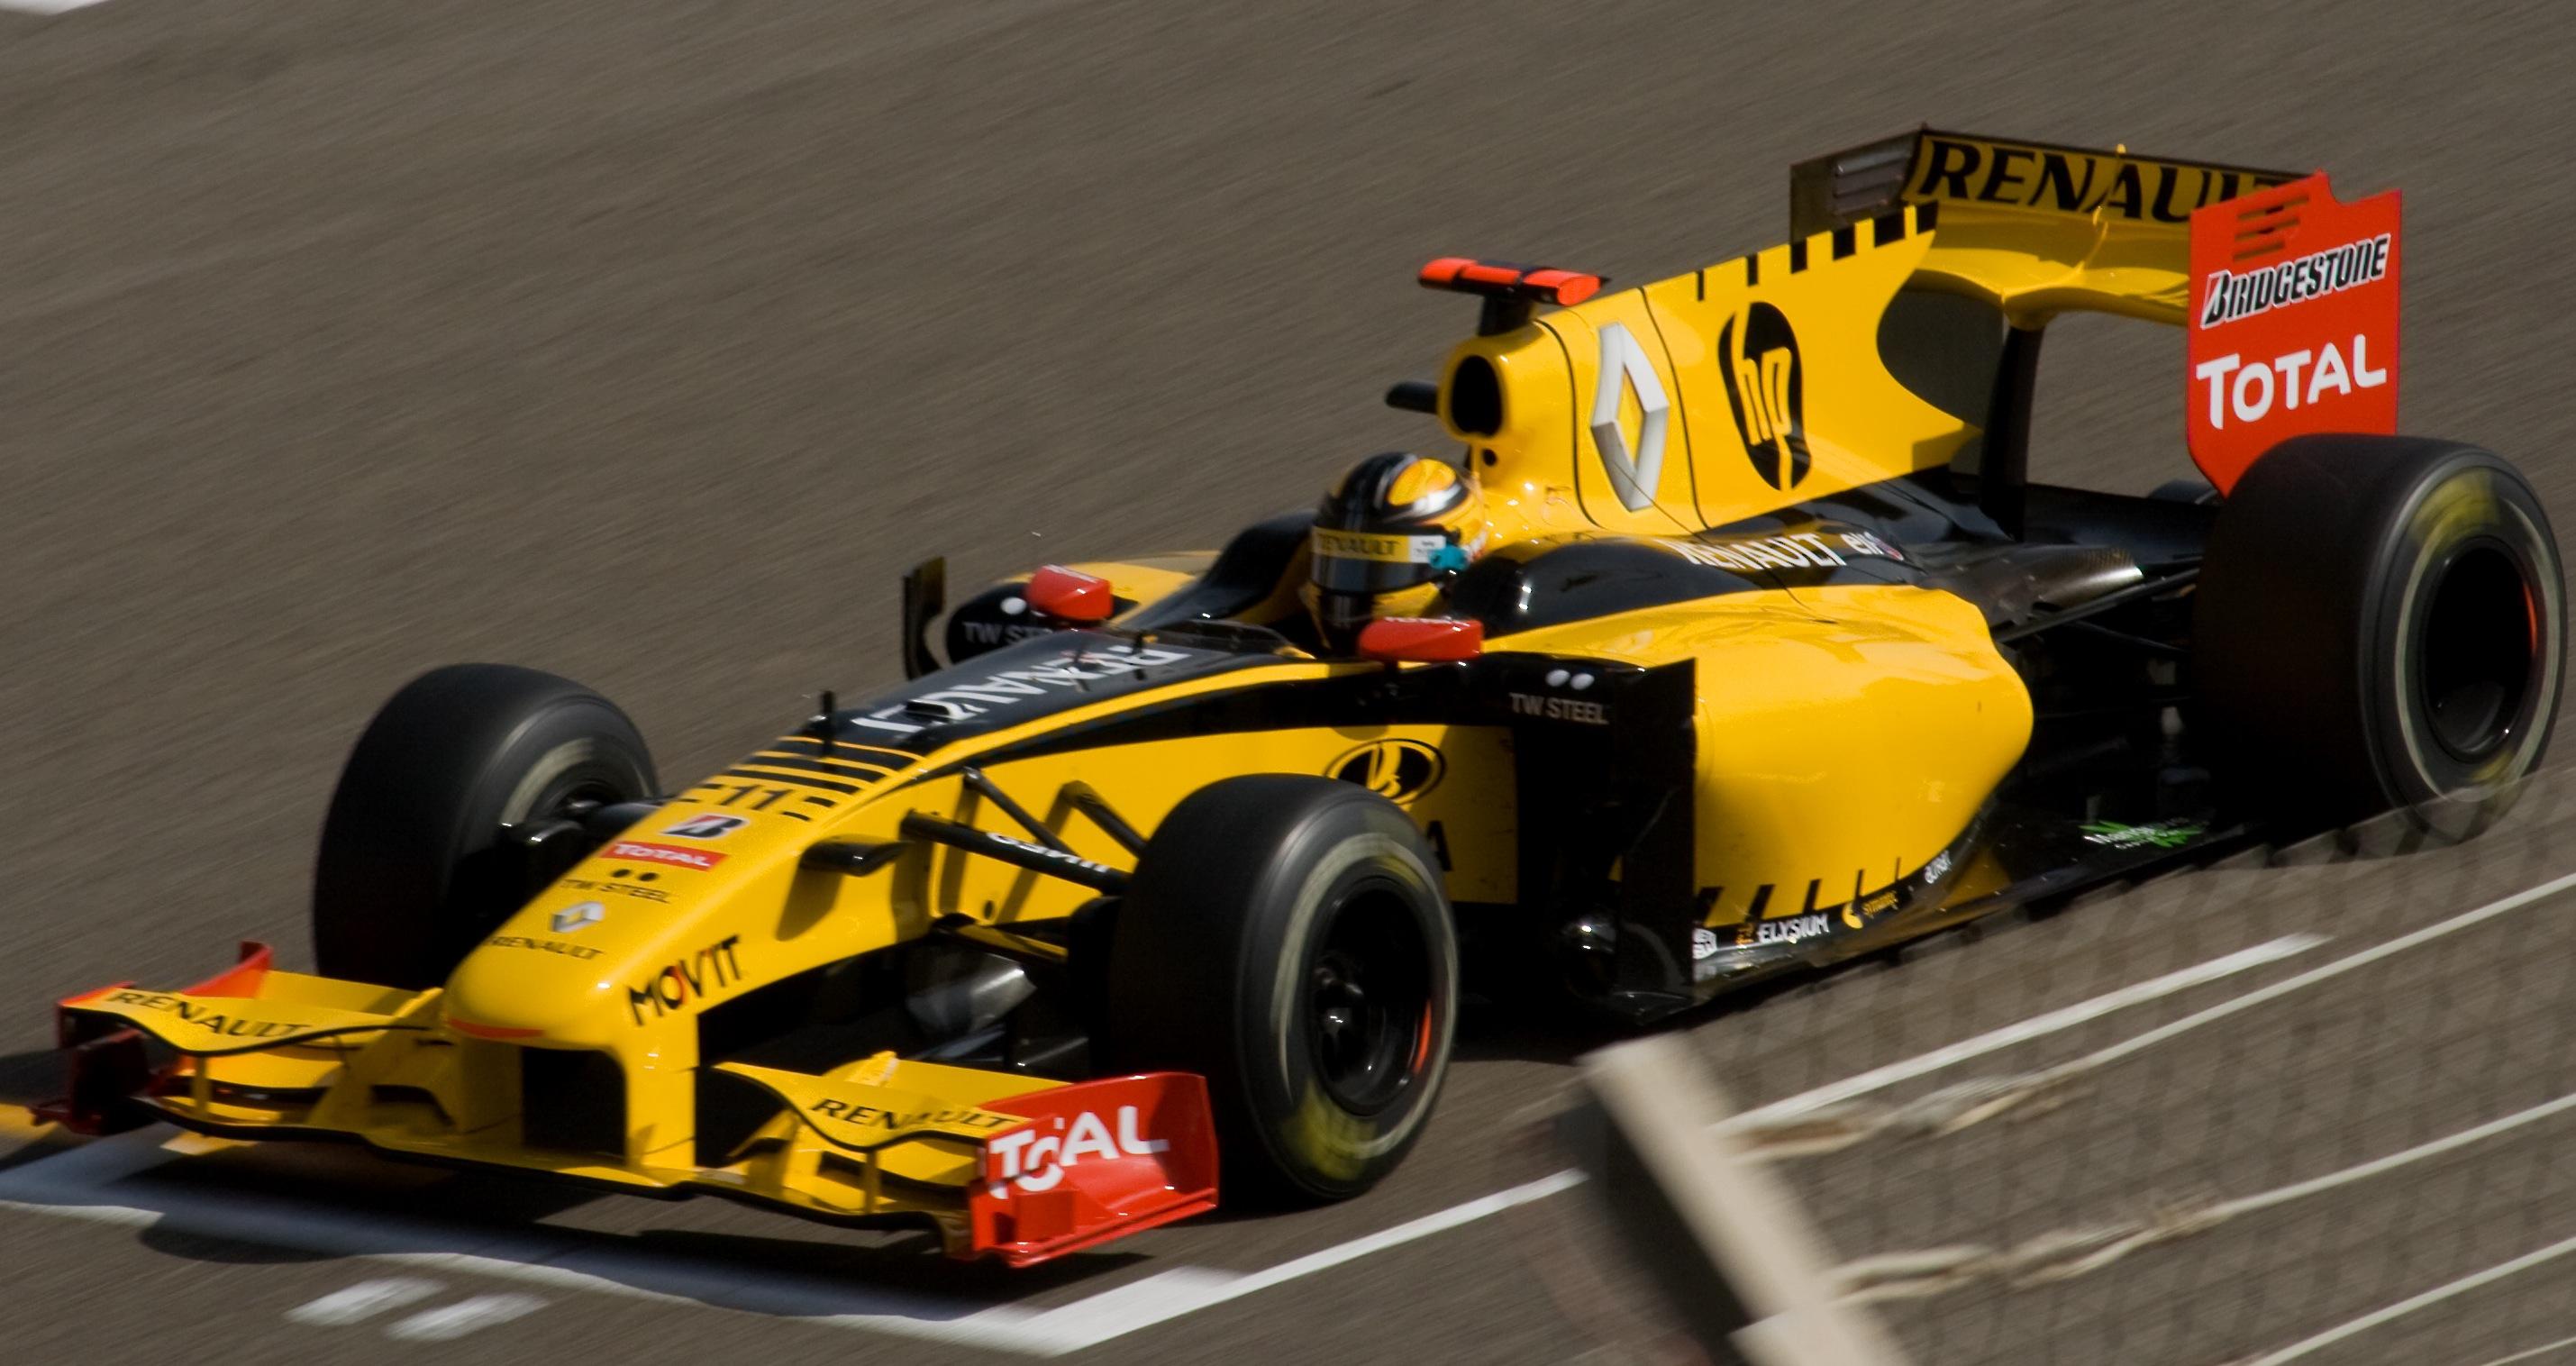 Kubica_Bahrain_Grand_Prix_2010_%28cropped%29.jpg